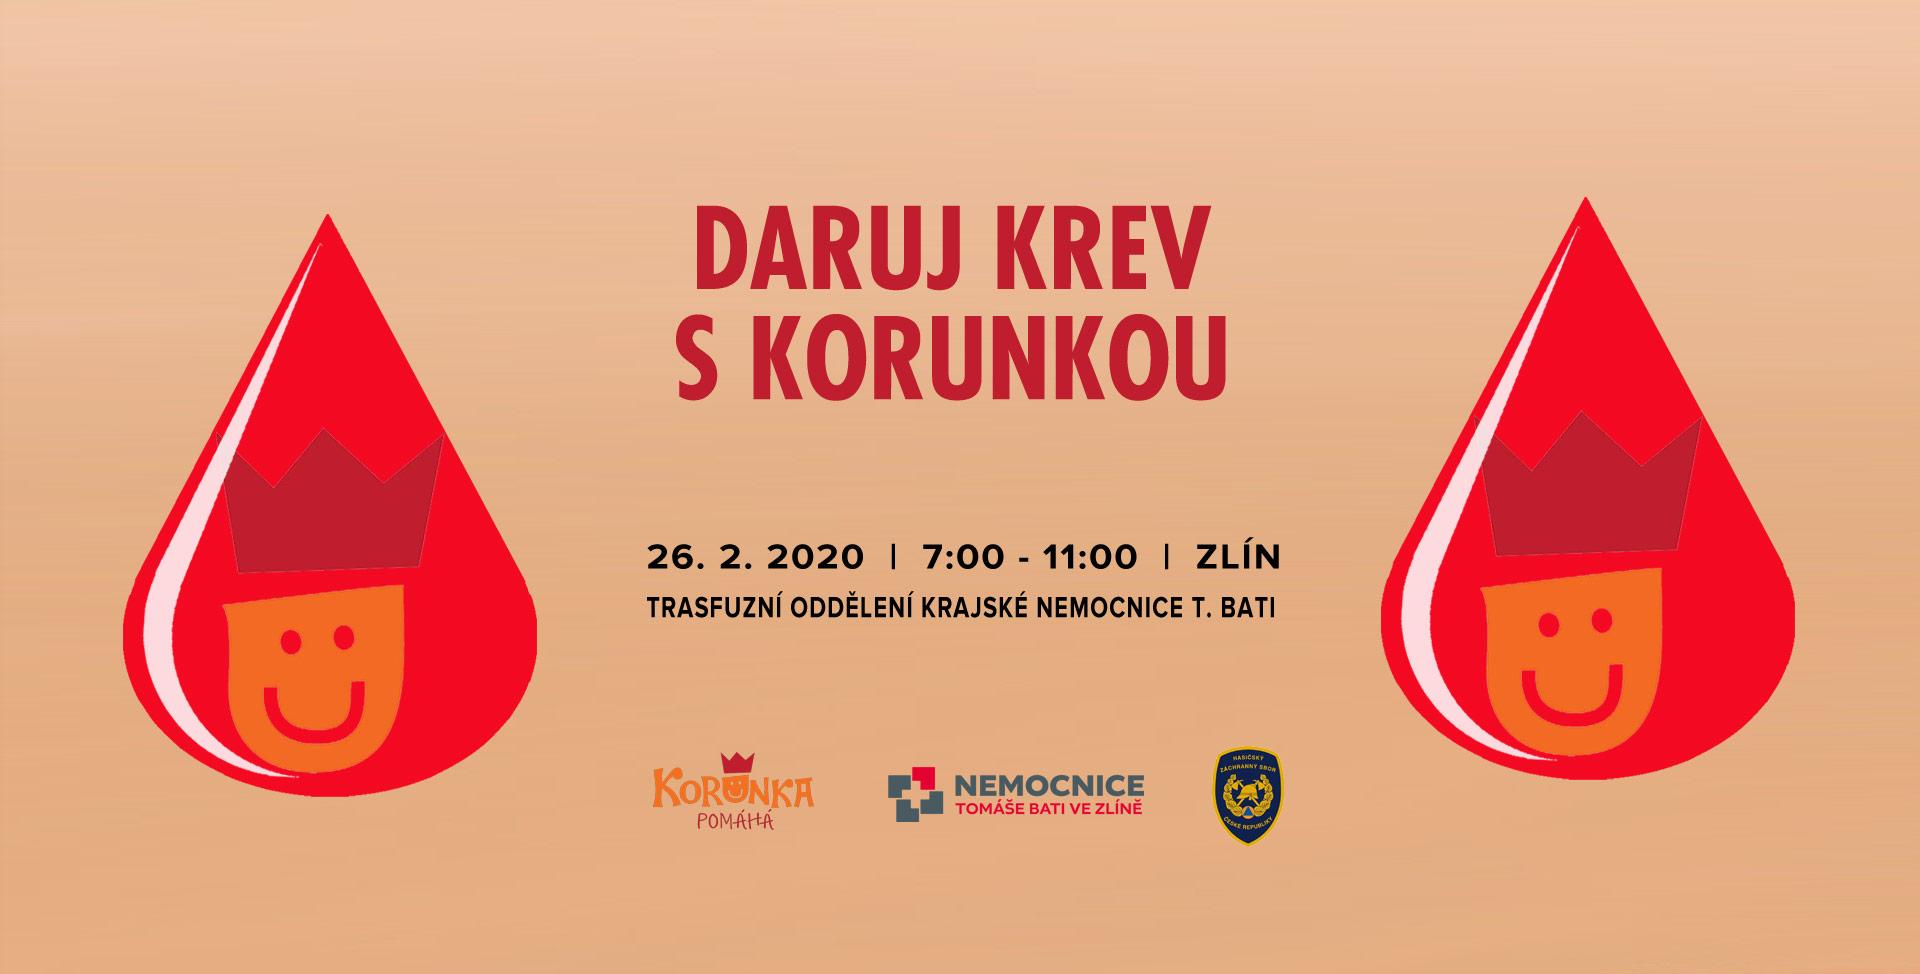 Daruj krev s Korunkou